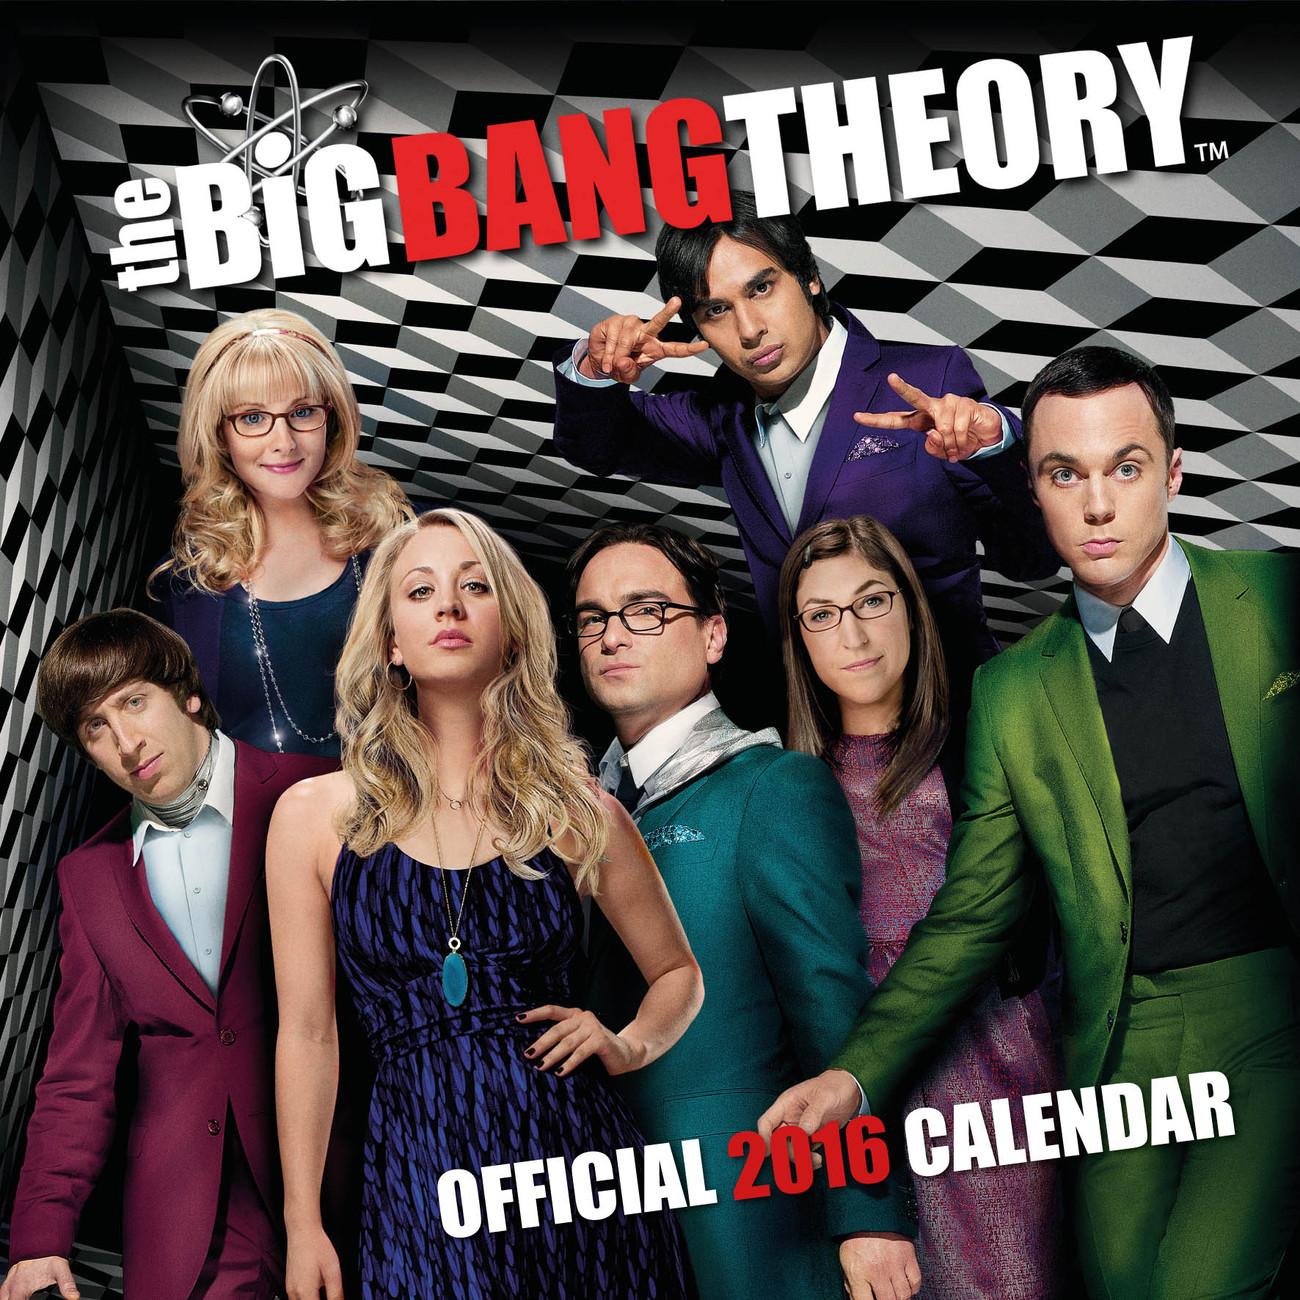 https://static.posters.cz/image/1300/kalender/the-big-bang-theory-i27125.jpg